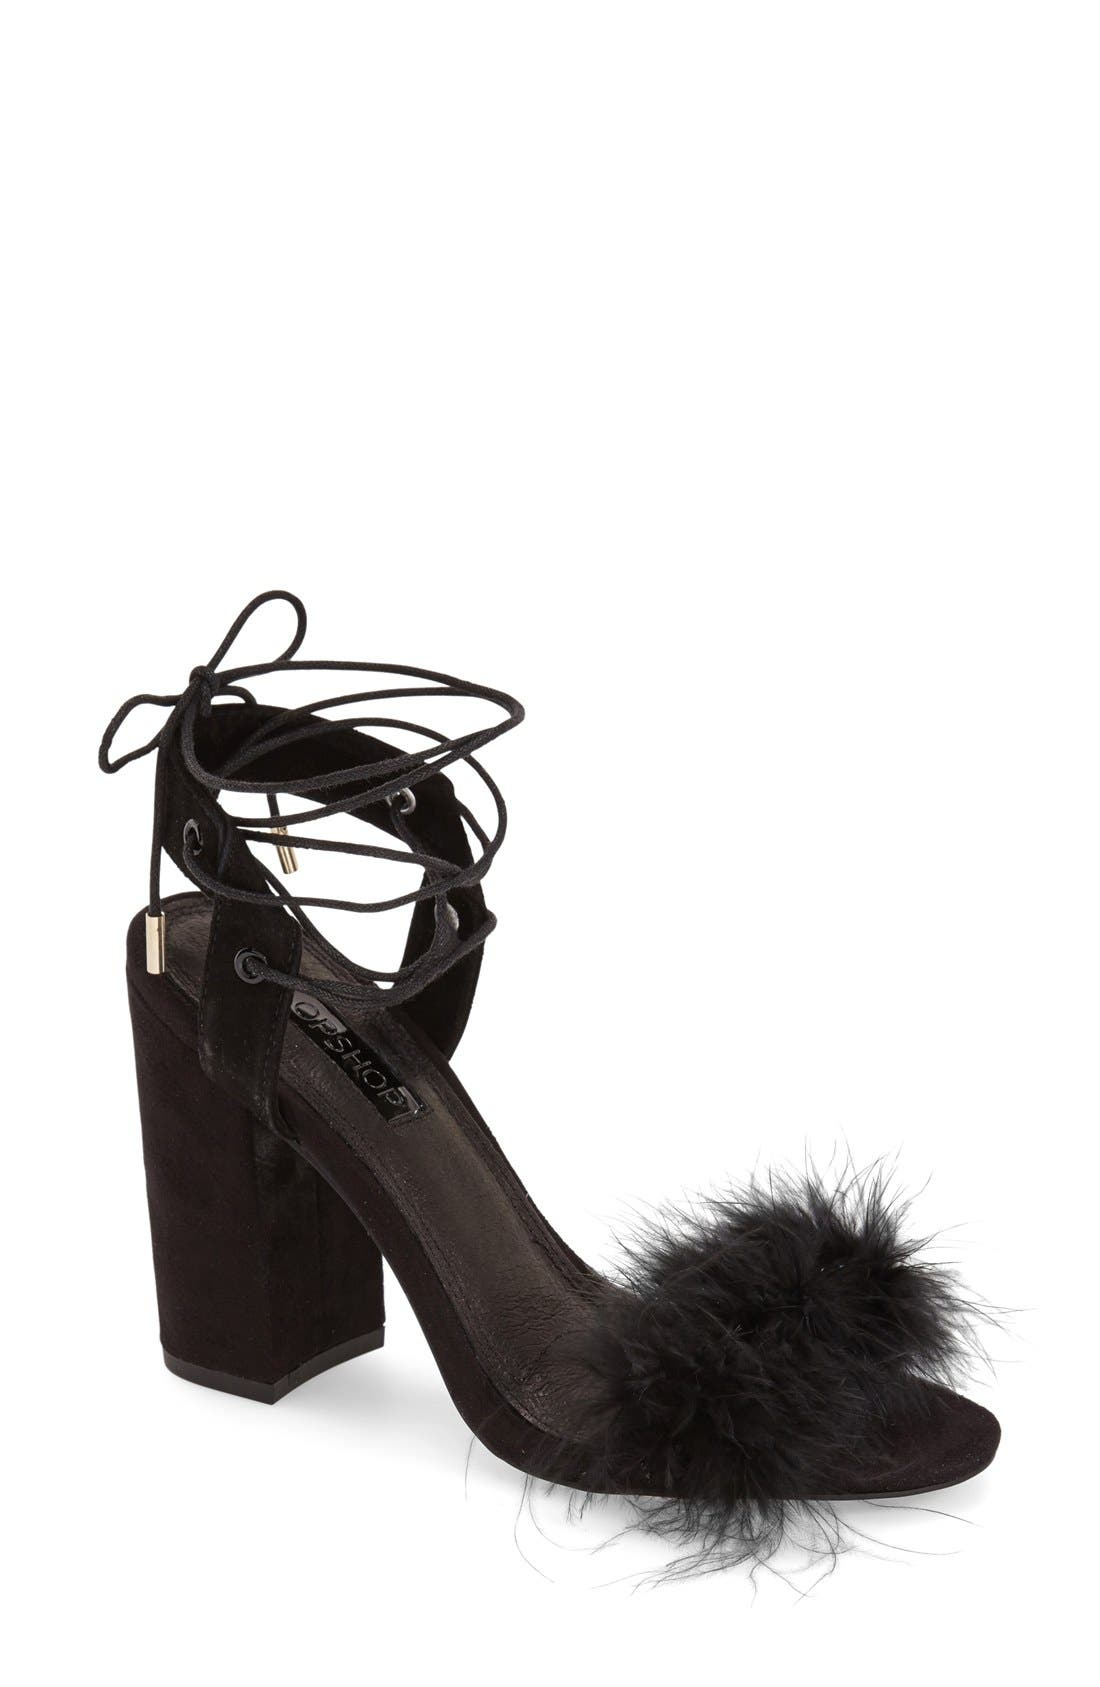 Marabou Feather Lace-Up Sandal,                             Main thumbnail 1, color,                             001